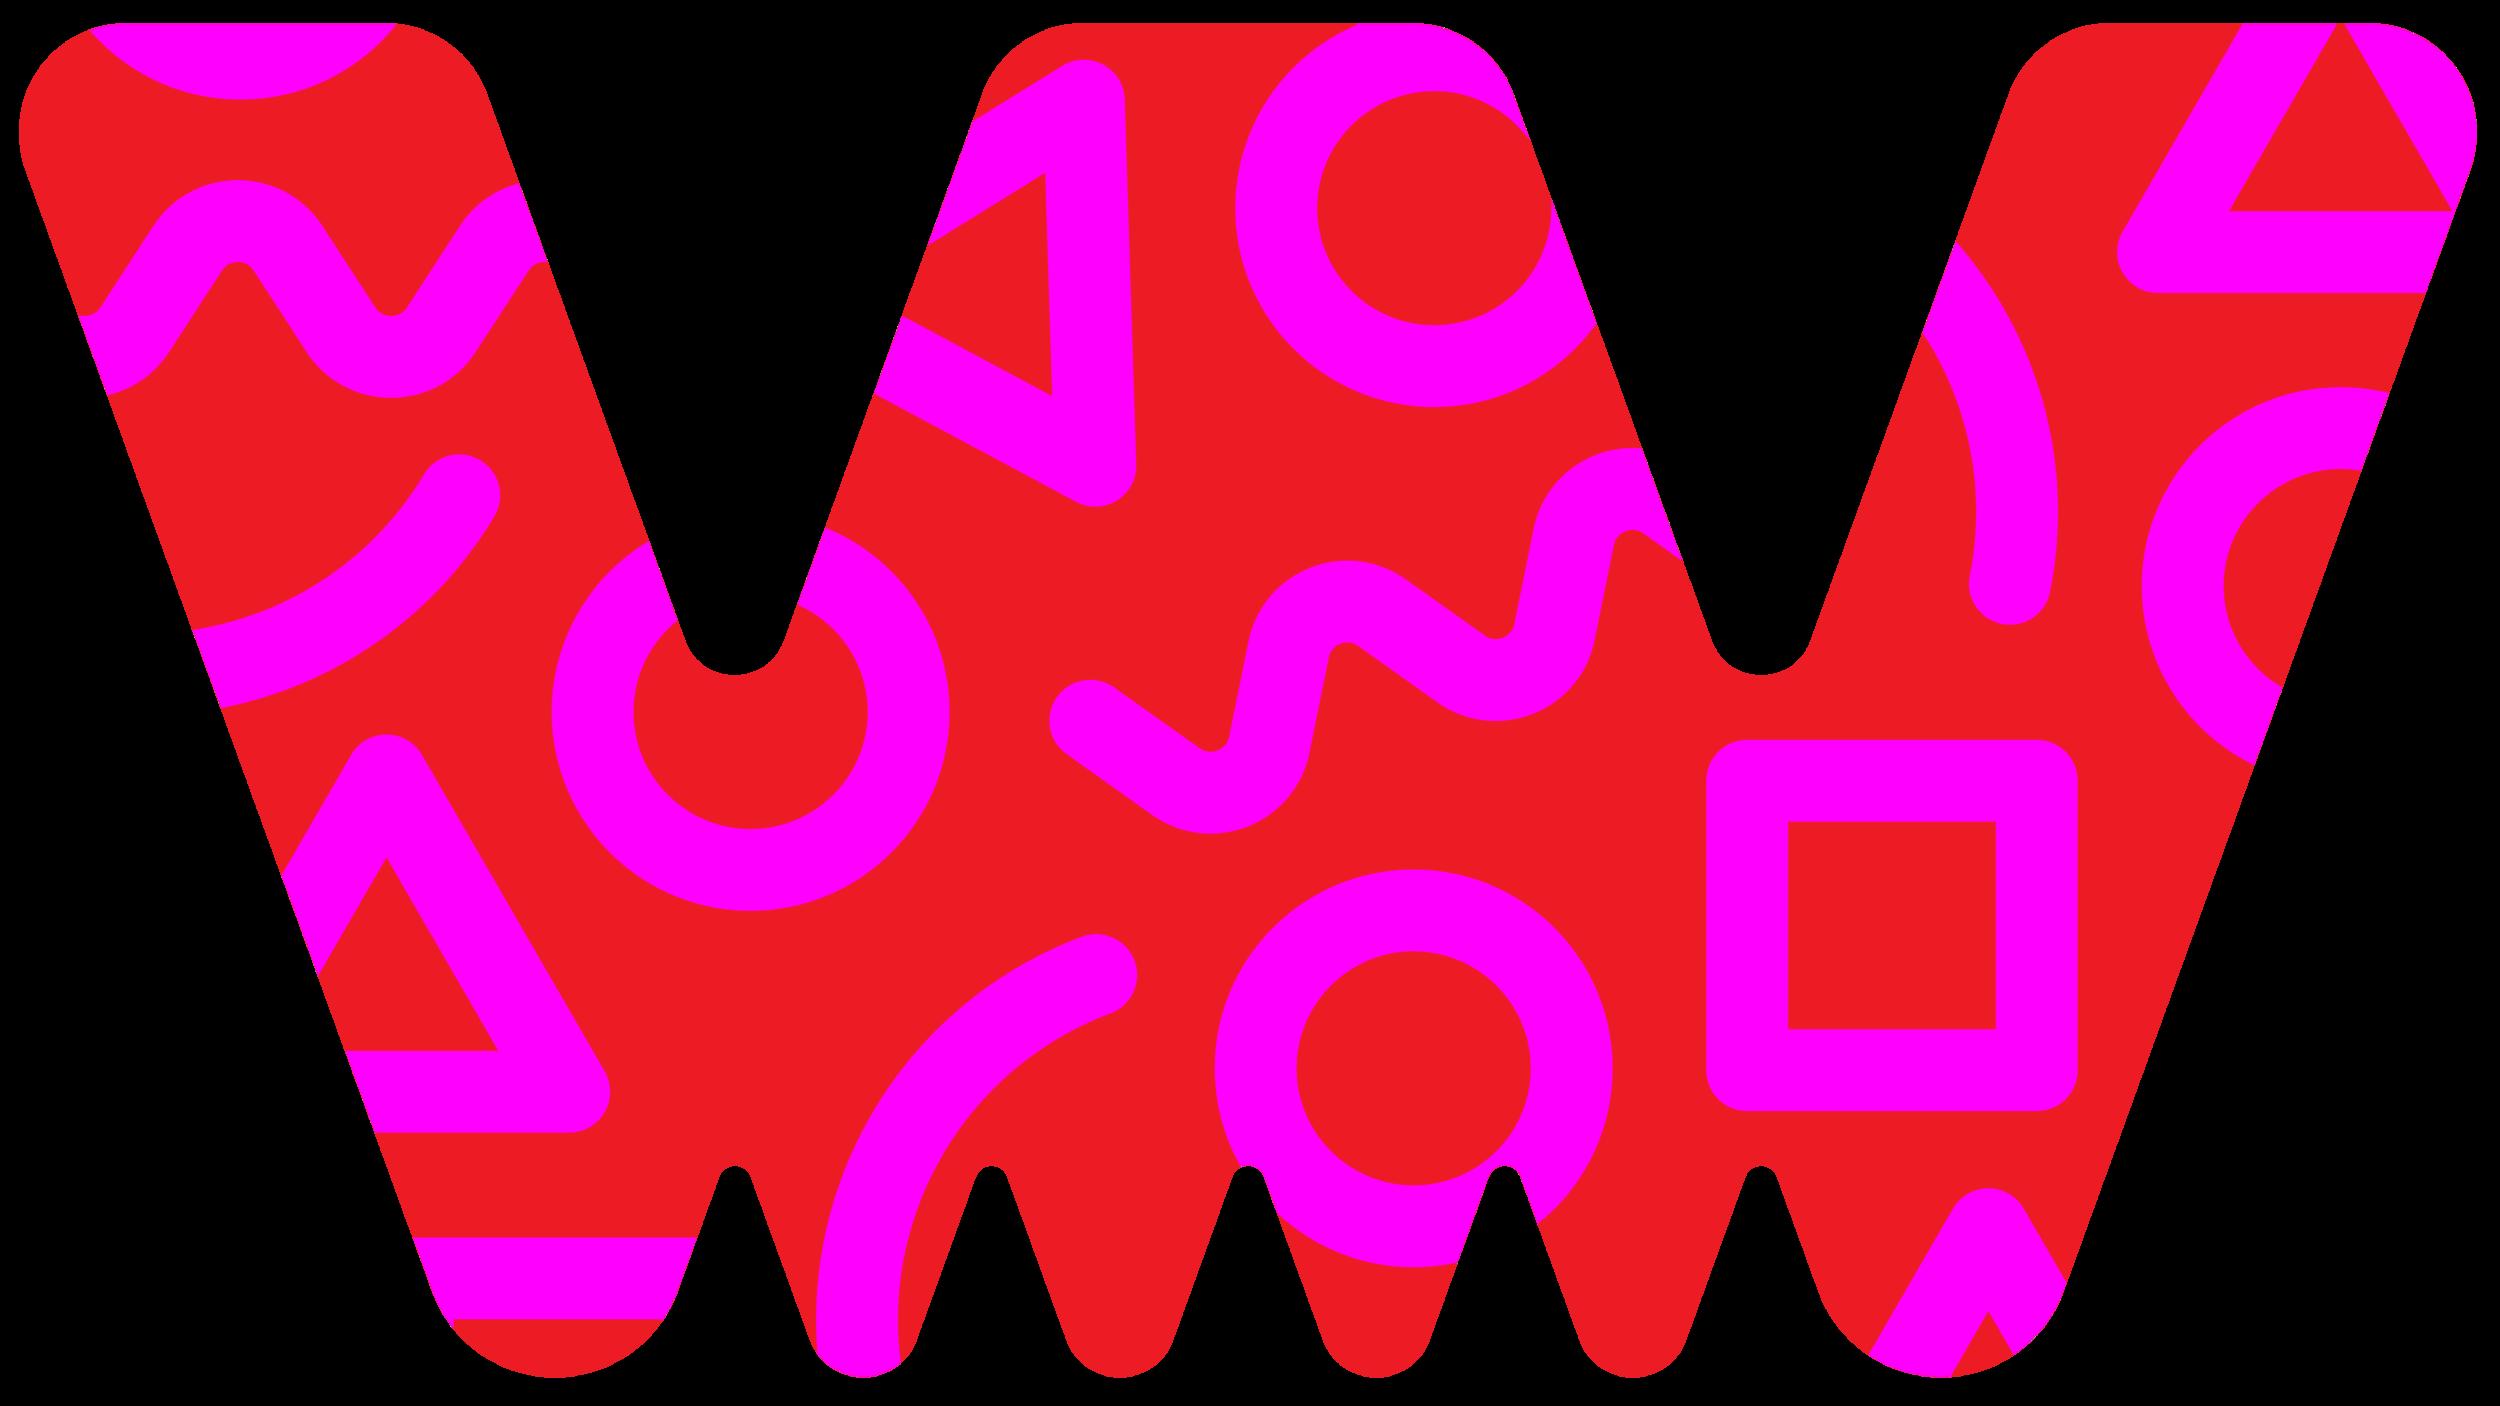 WildDingo_W_Symbol_RGB_Patterns-08.png